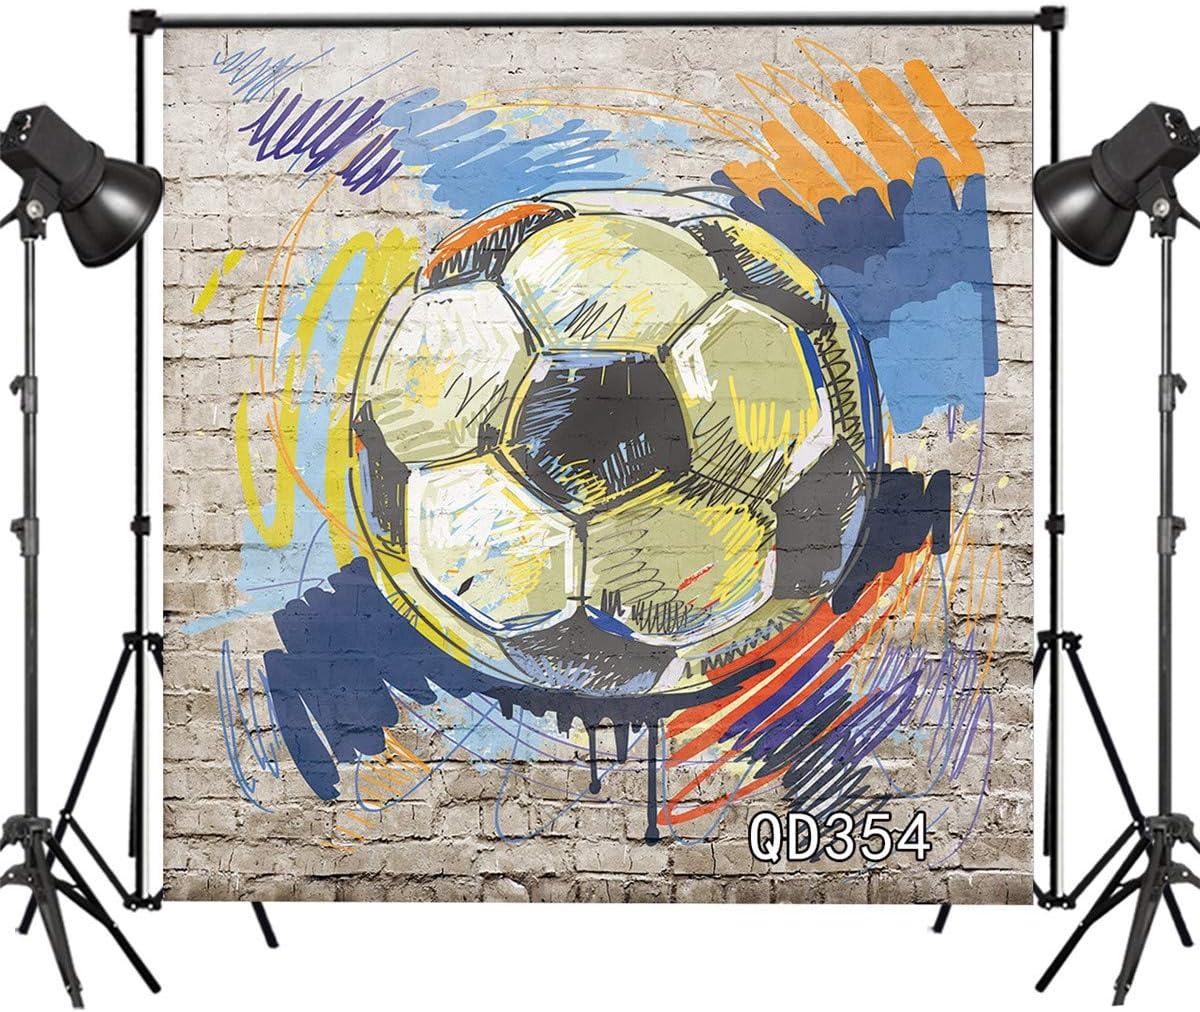 LB Graffiti Football Backdrop for Photography 10x10ft Brick Wall Portrait Photo Background Studio Prop Vinyl Customized QD354